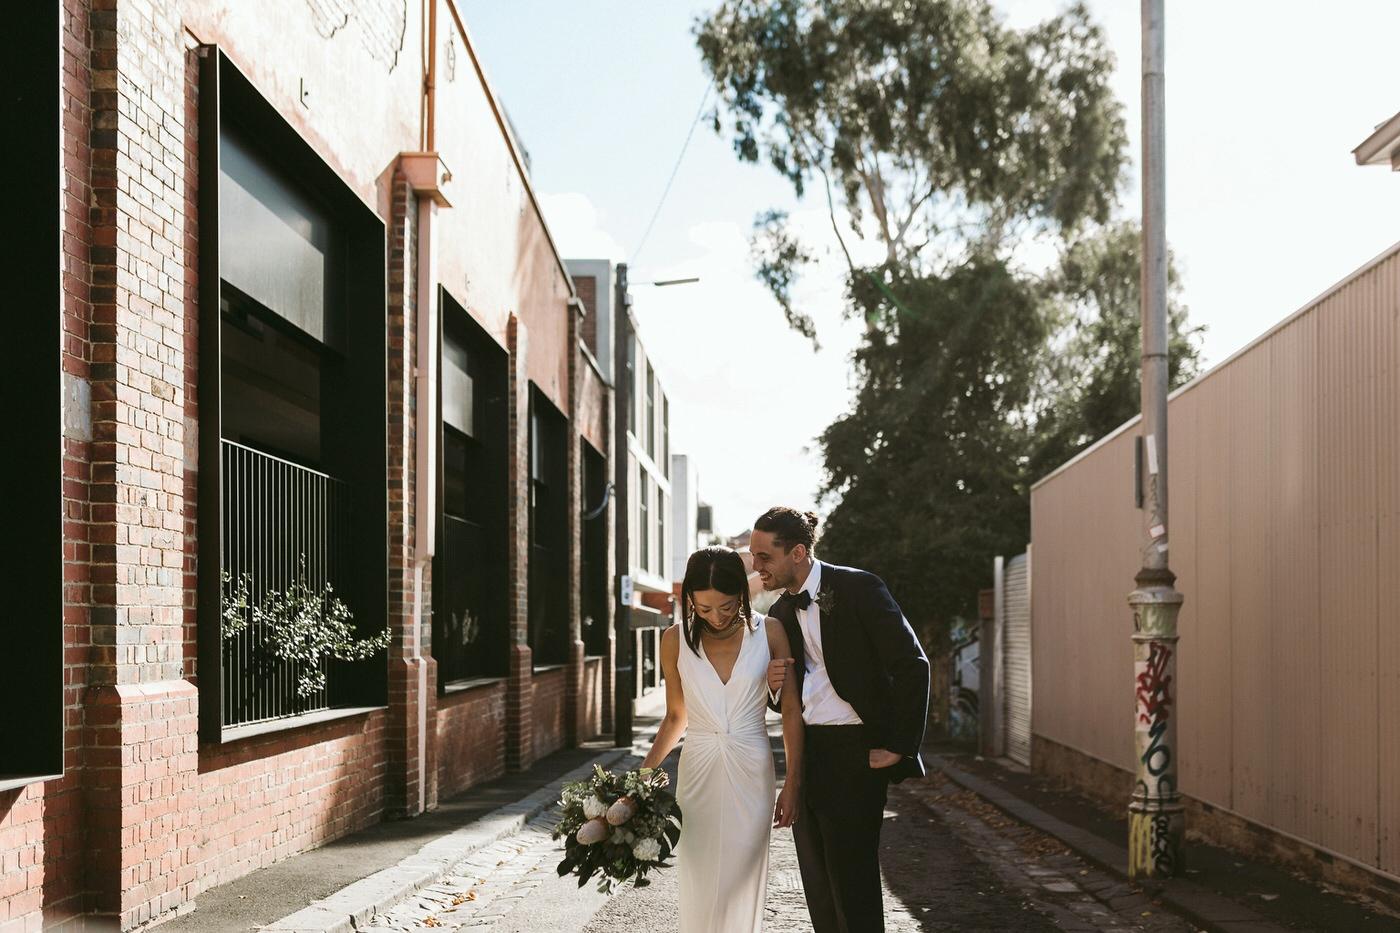 GoldandGrit_KimMatt_Panama-Dining-Room-Fitzroy-Collingwood-Relaxed-Fun-Candid-Wedding-Photography_47.jpg